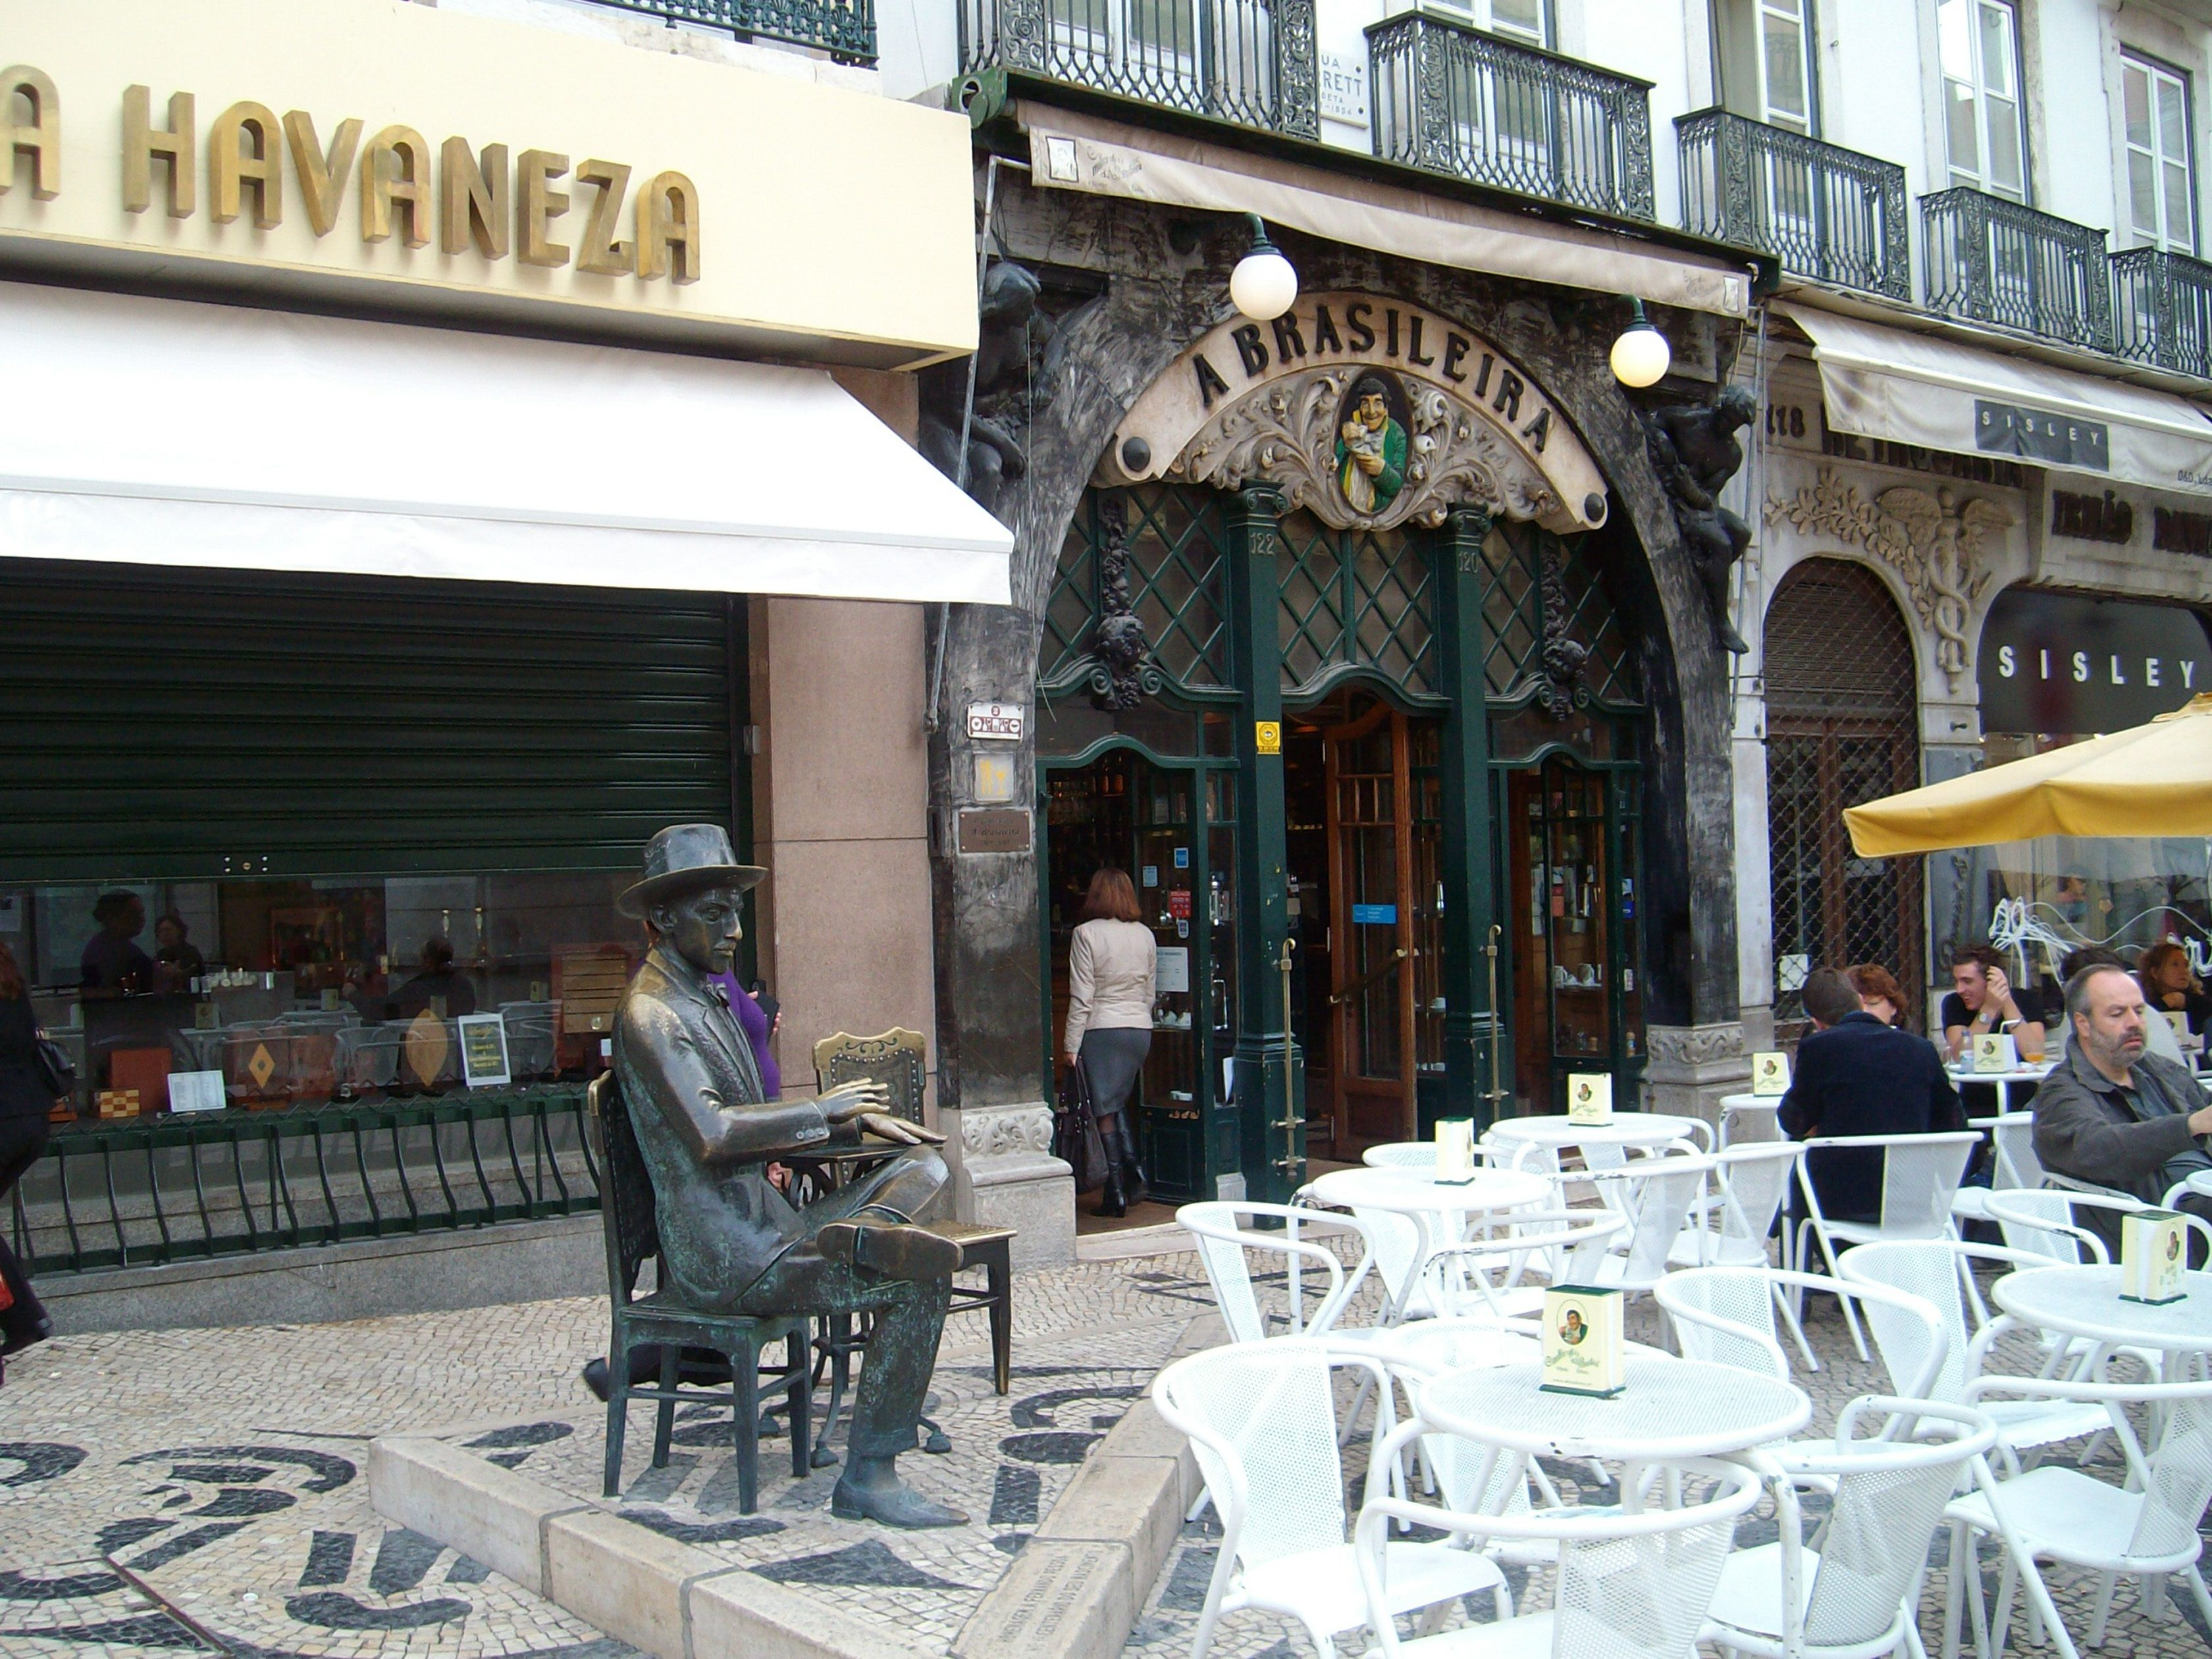 Café A Brasileira • een van de oudste en beroemdste cafés van Lissabon